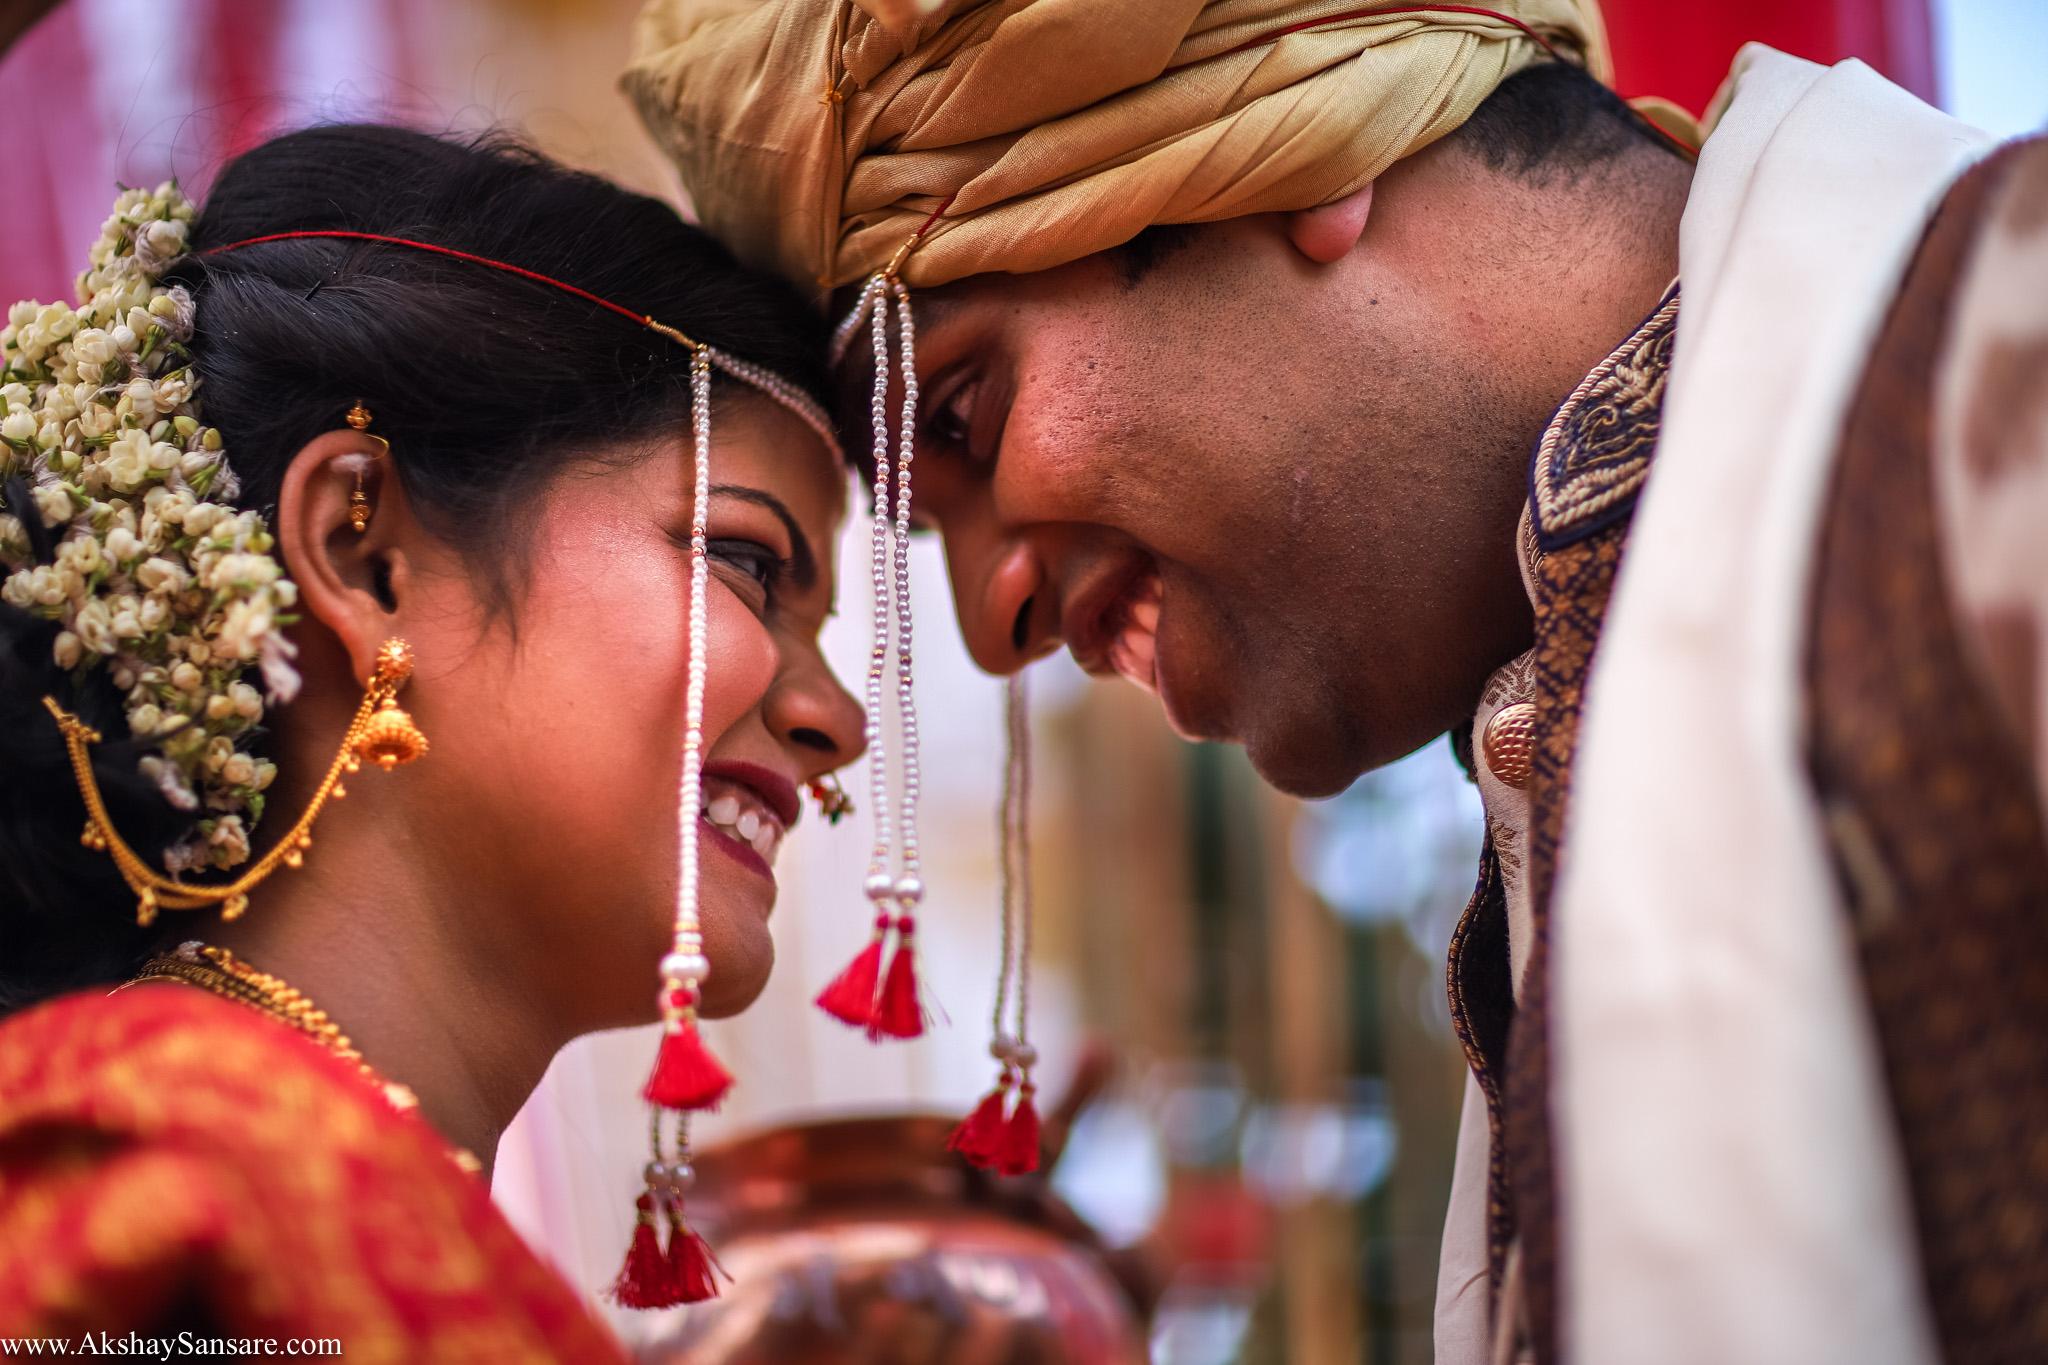 Salil x Kimaya Akshay Sansare Photography Candid wedding Photographer in mumbai best(26).jpg